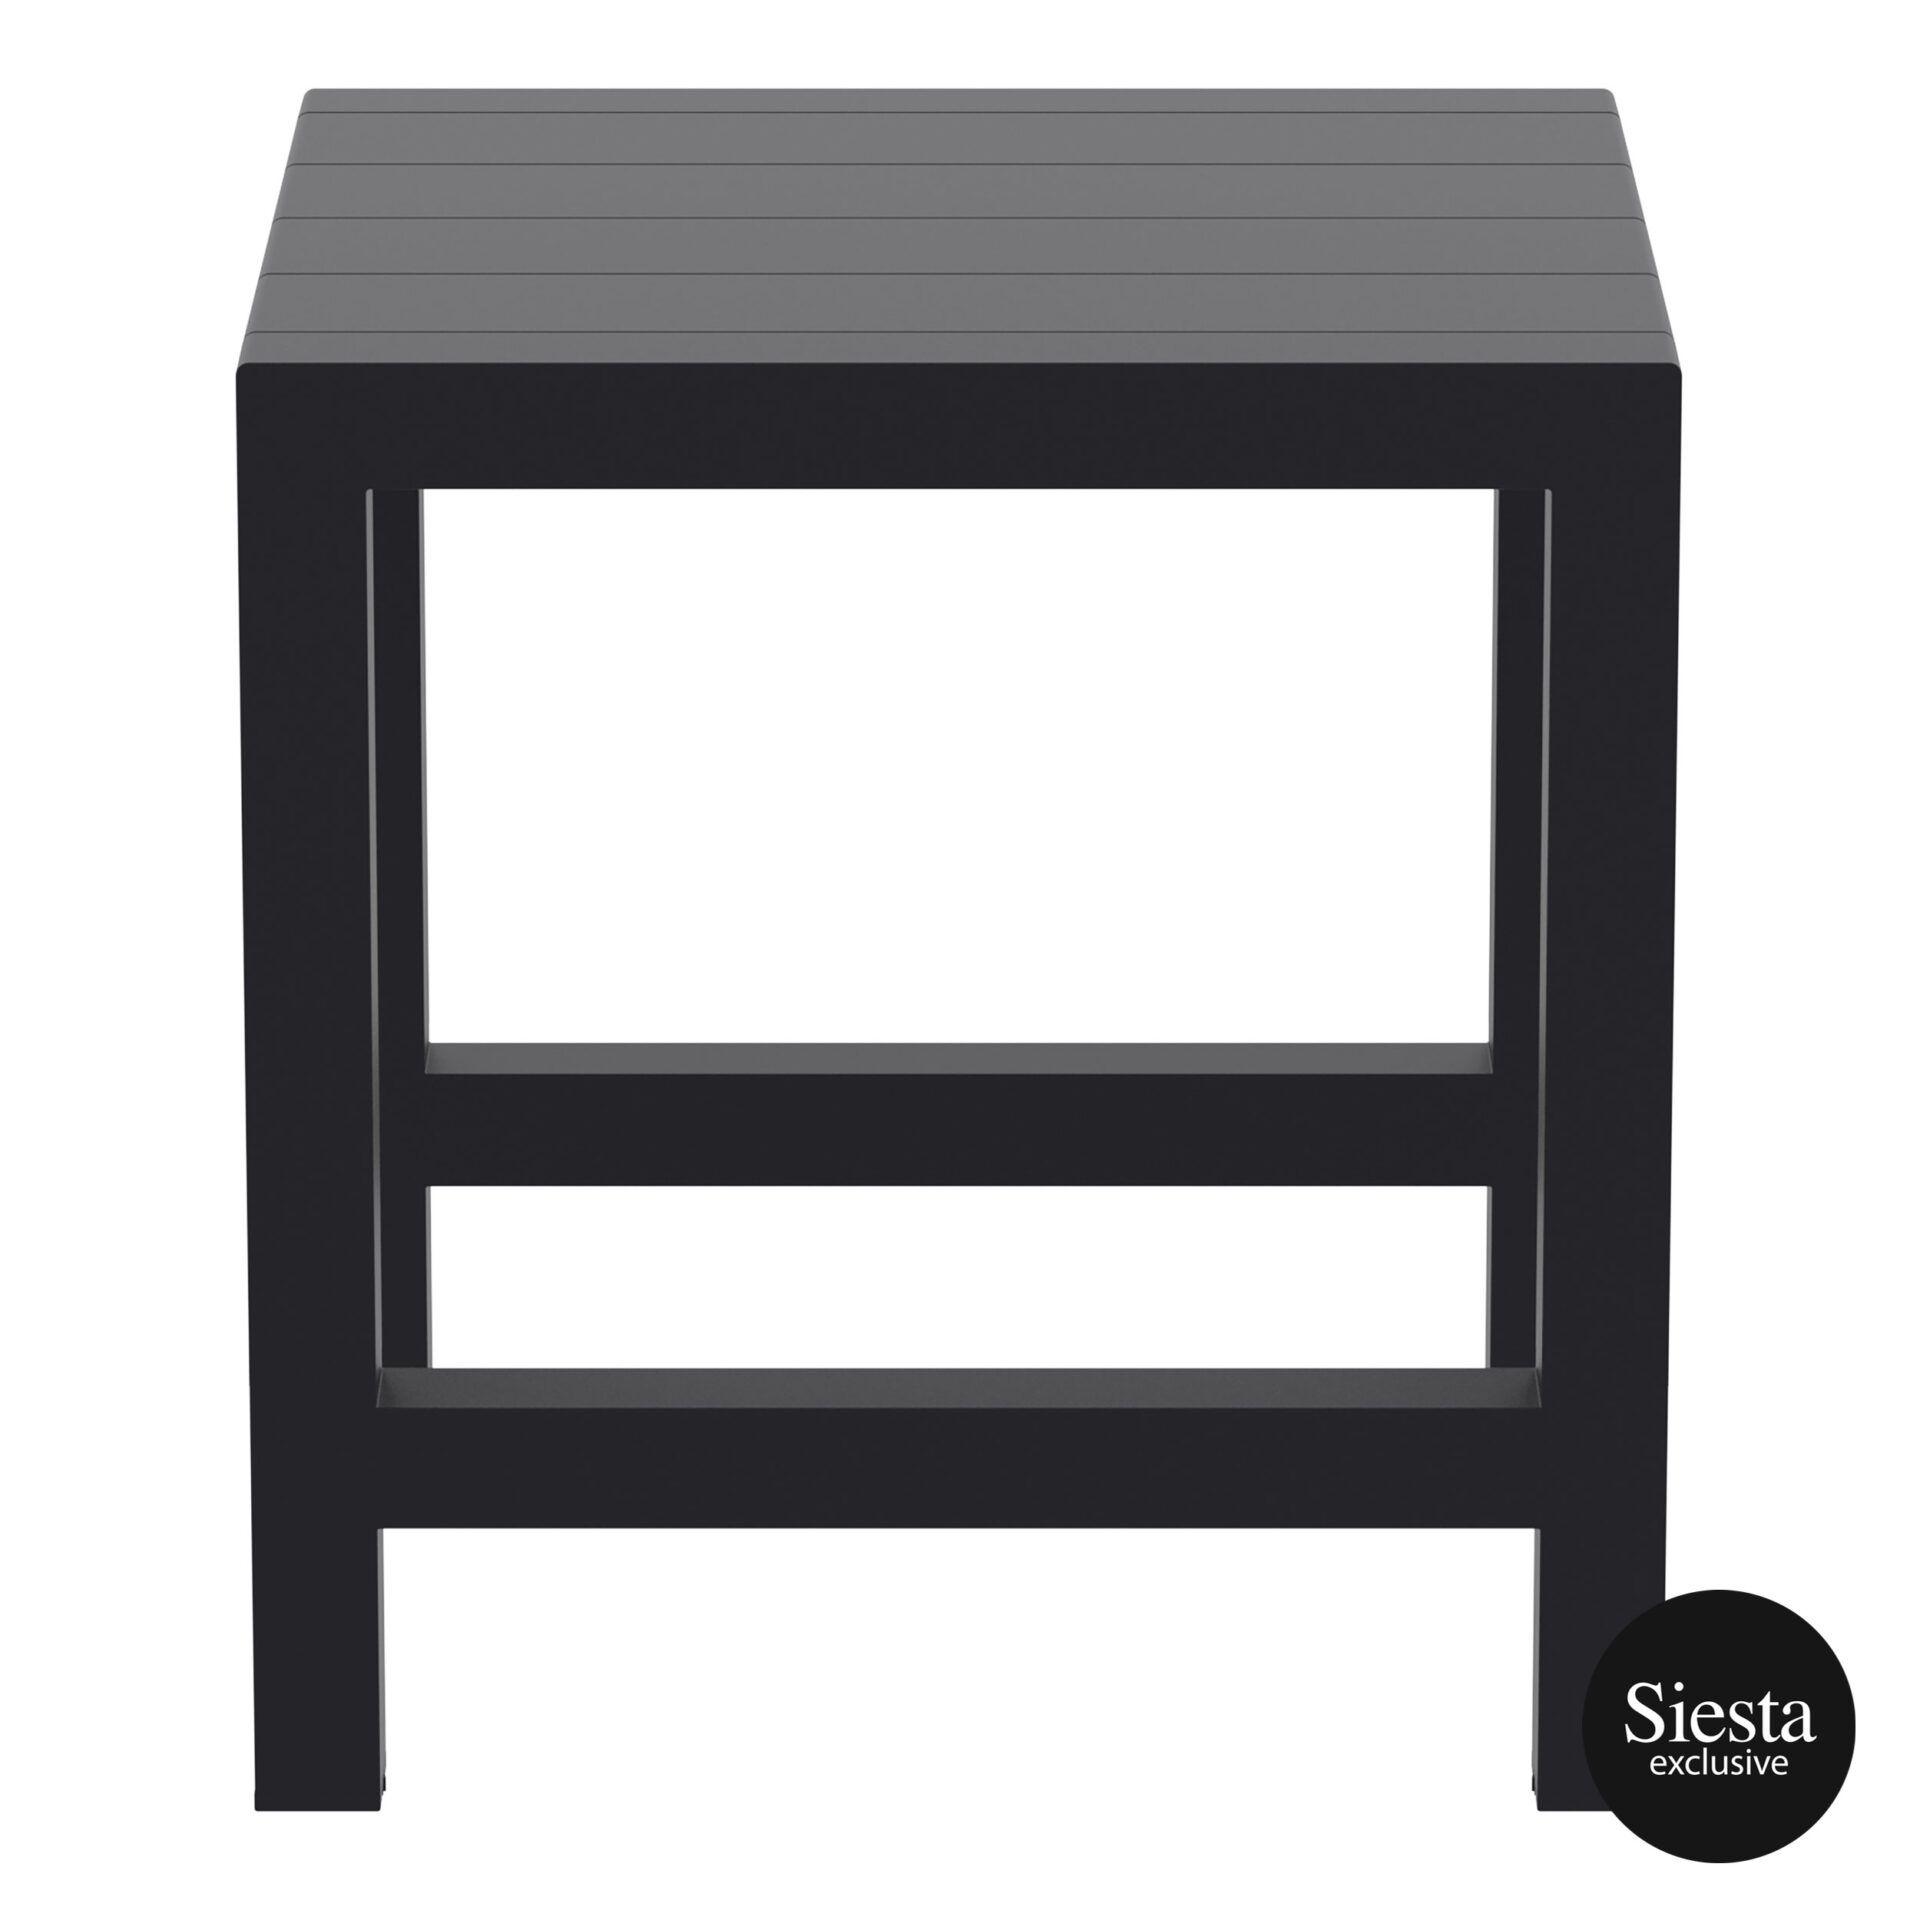 003 vegas bar table 100 black side